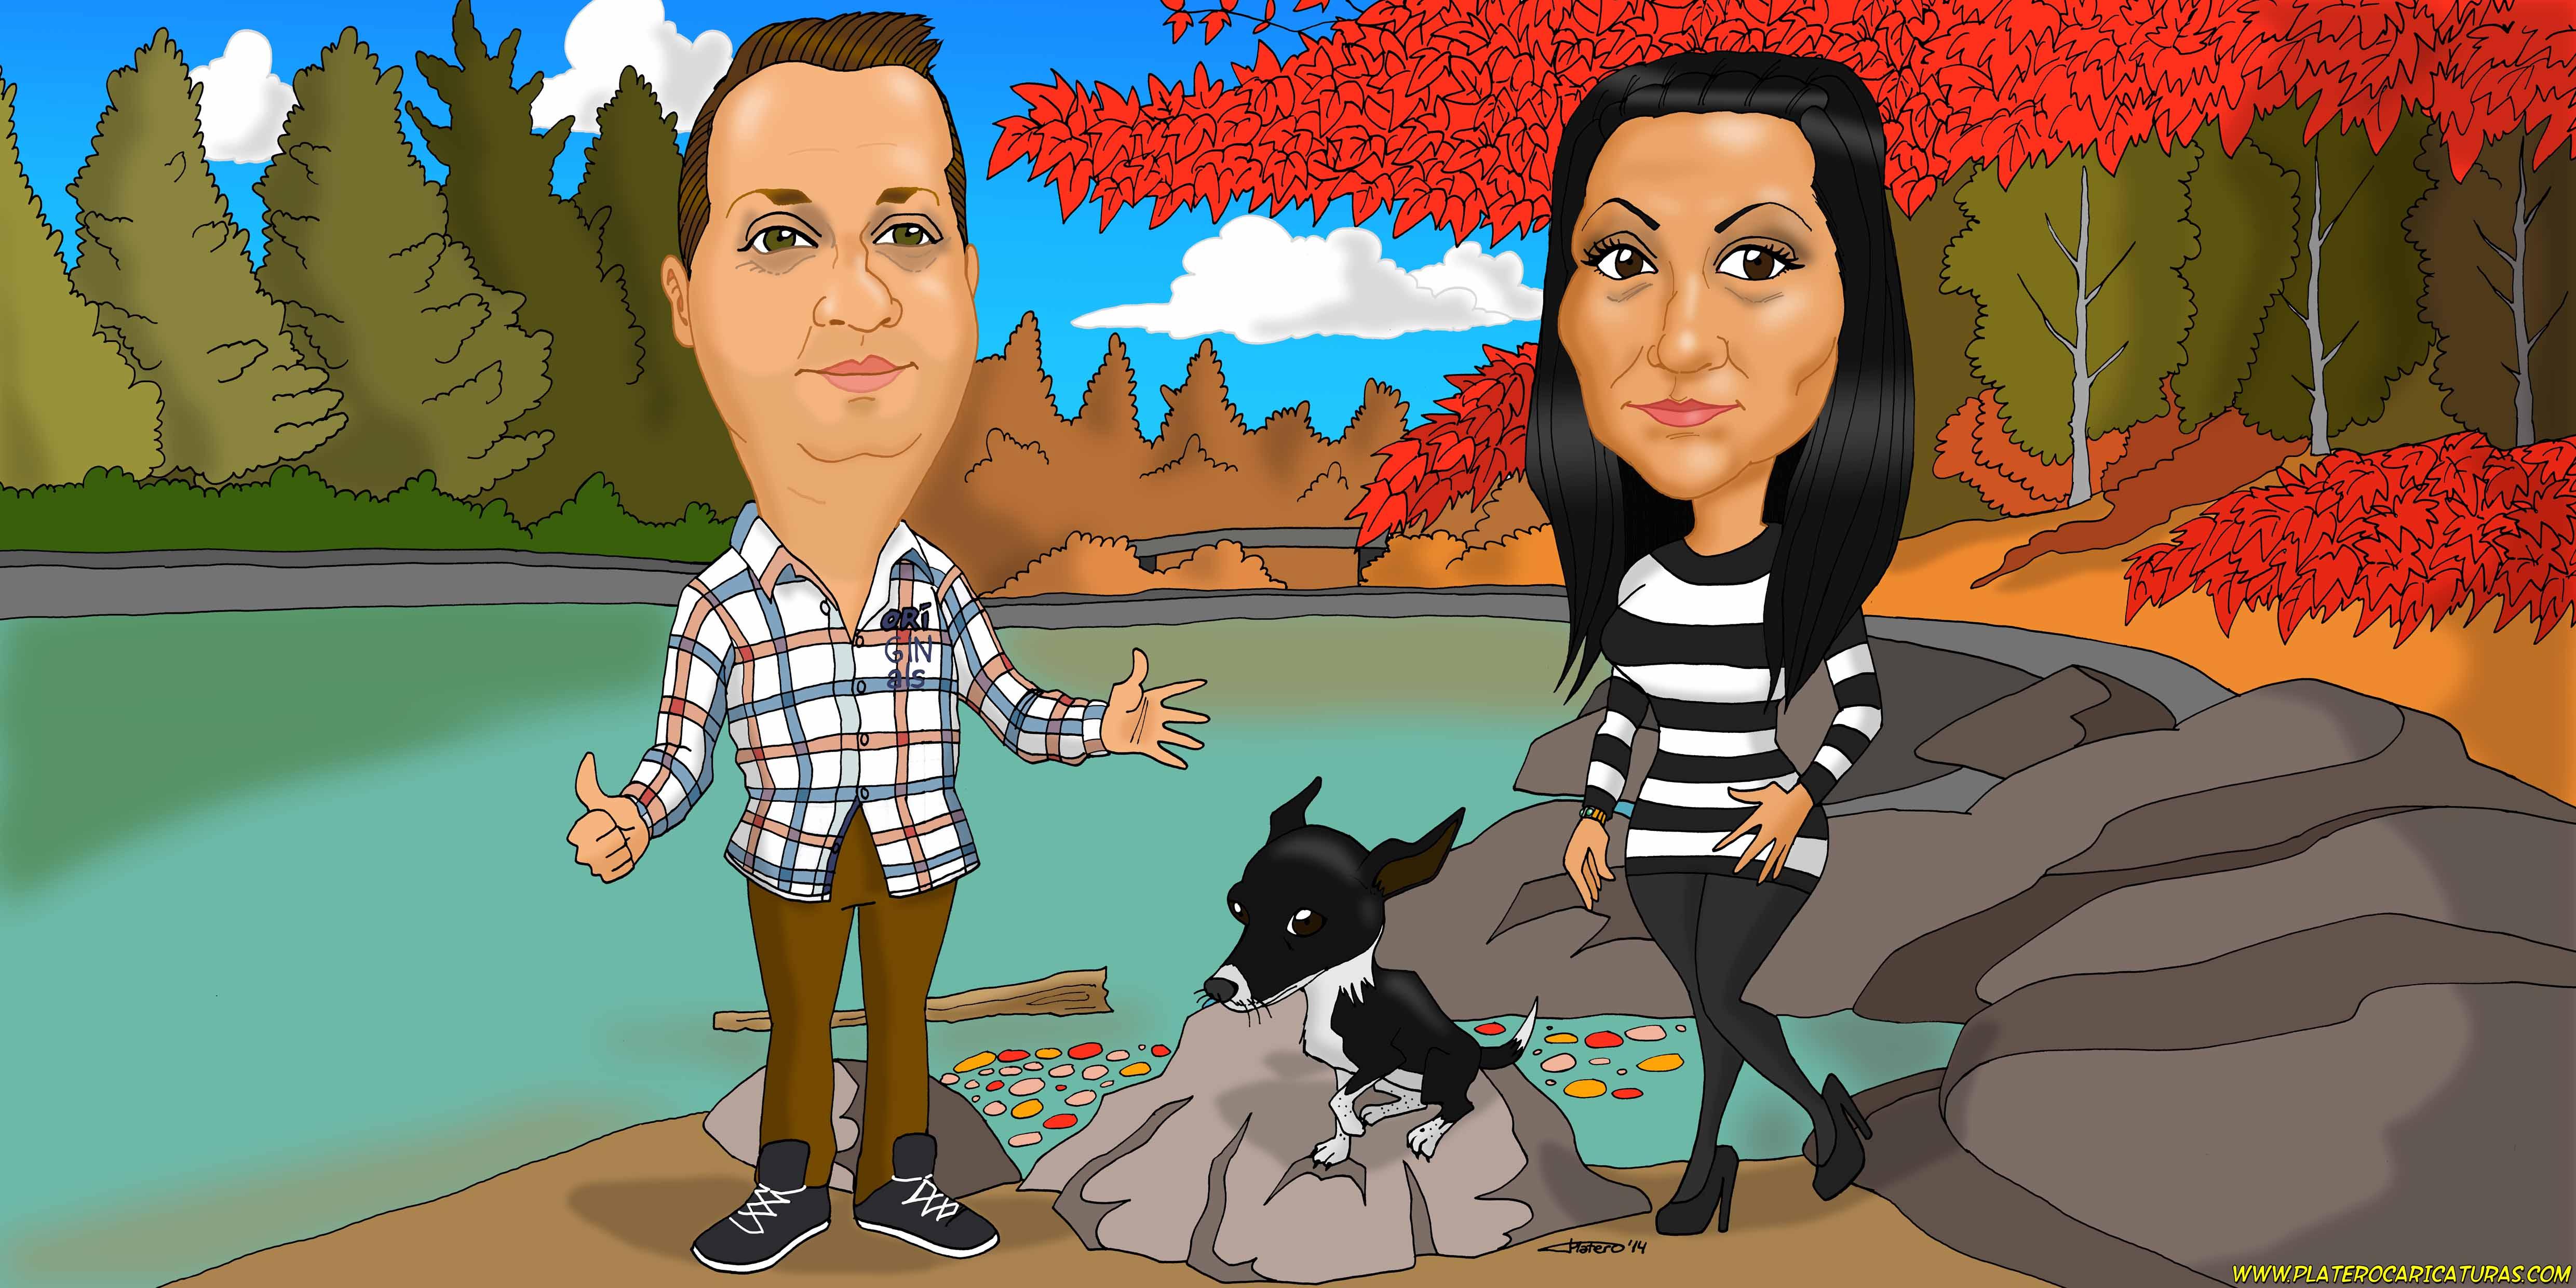 caricaturas a color por encargo personalizadas_pareja con paisaje_platerocaricat